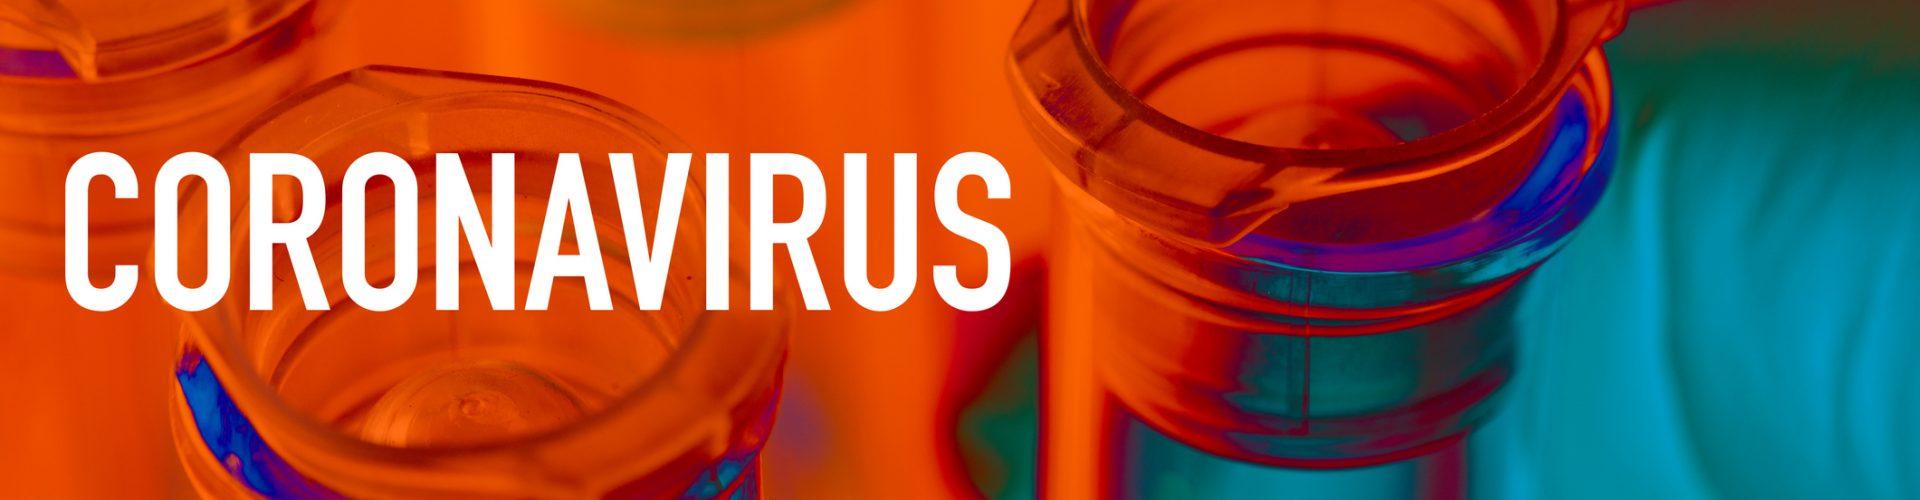 Corona virus: test tube with corona virus, covid-19